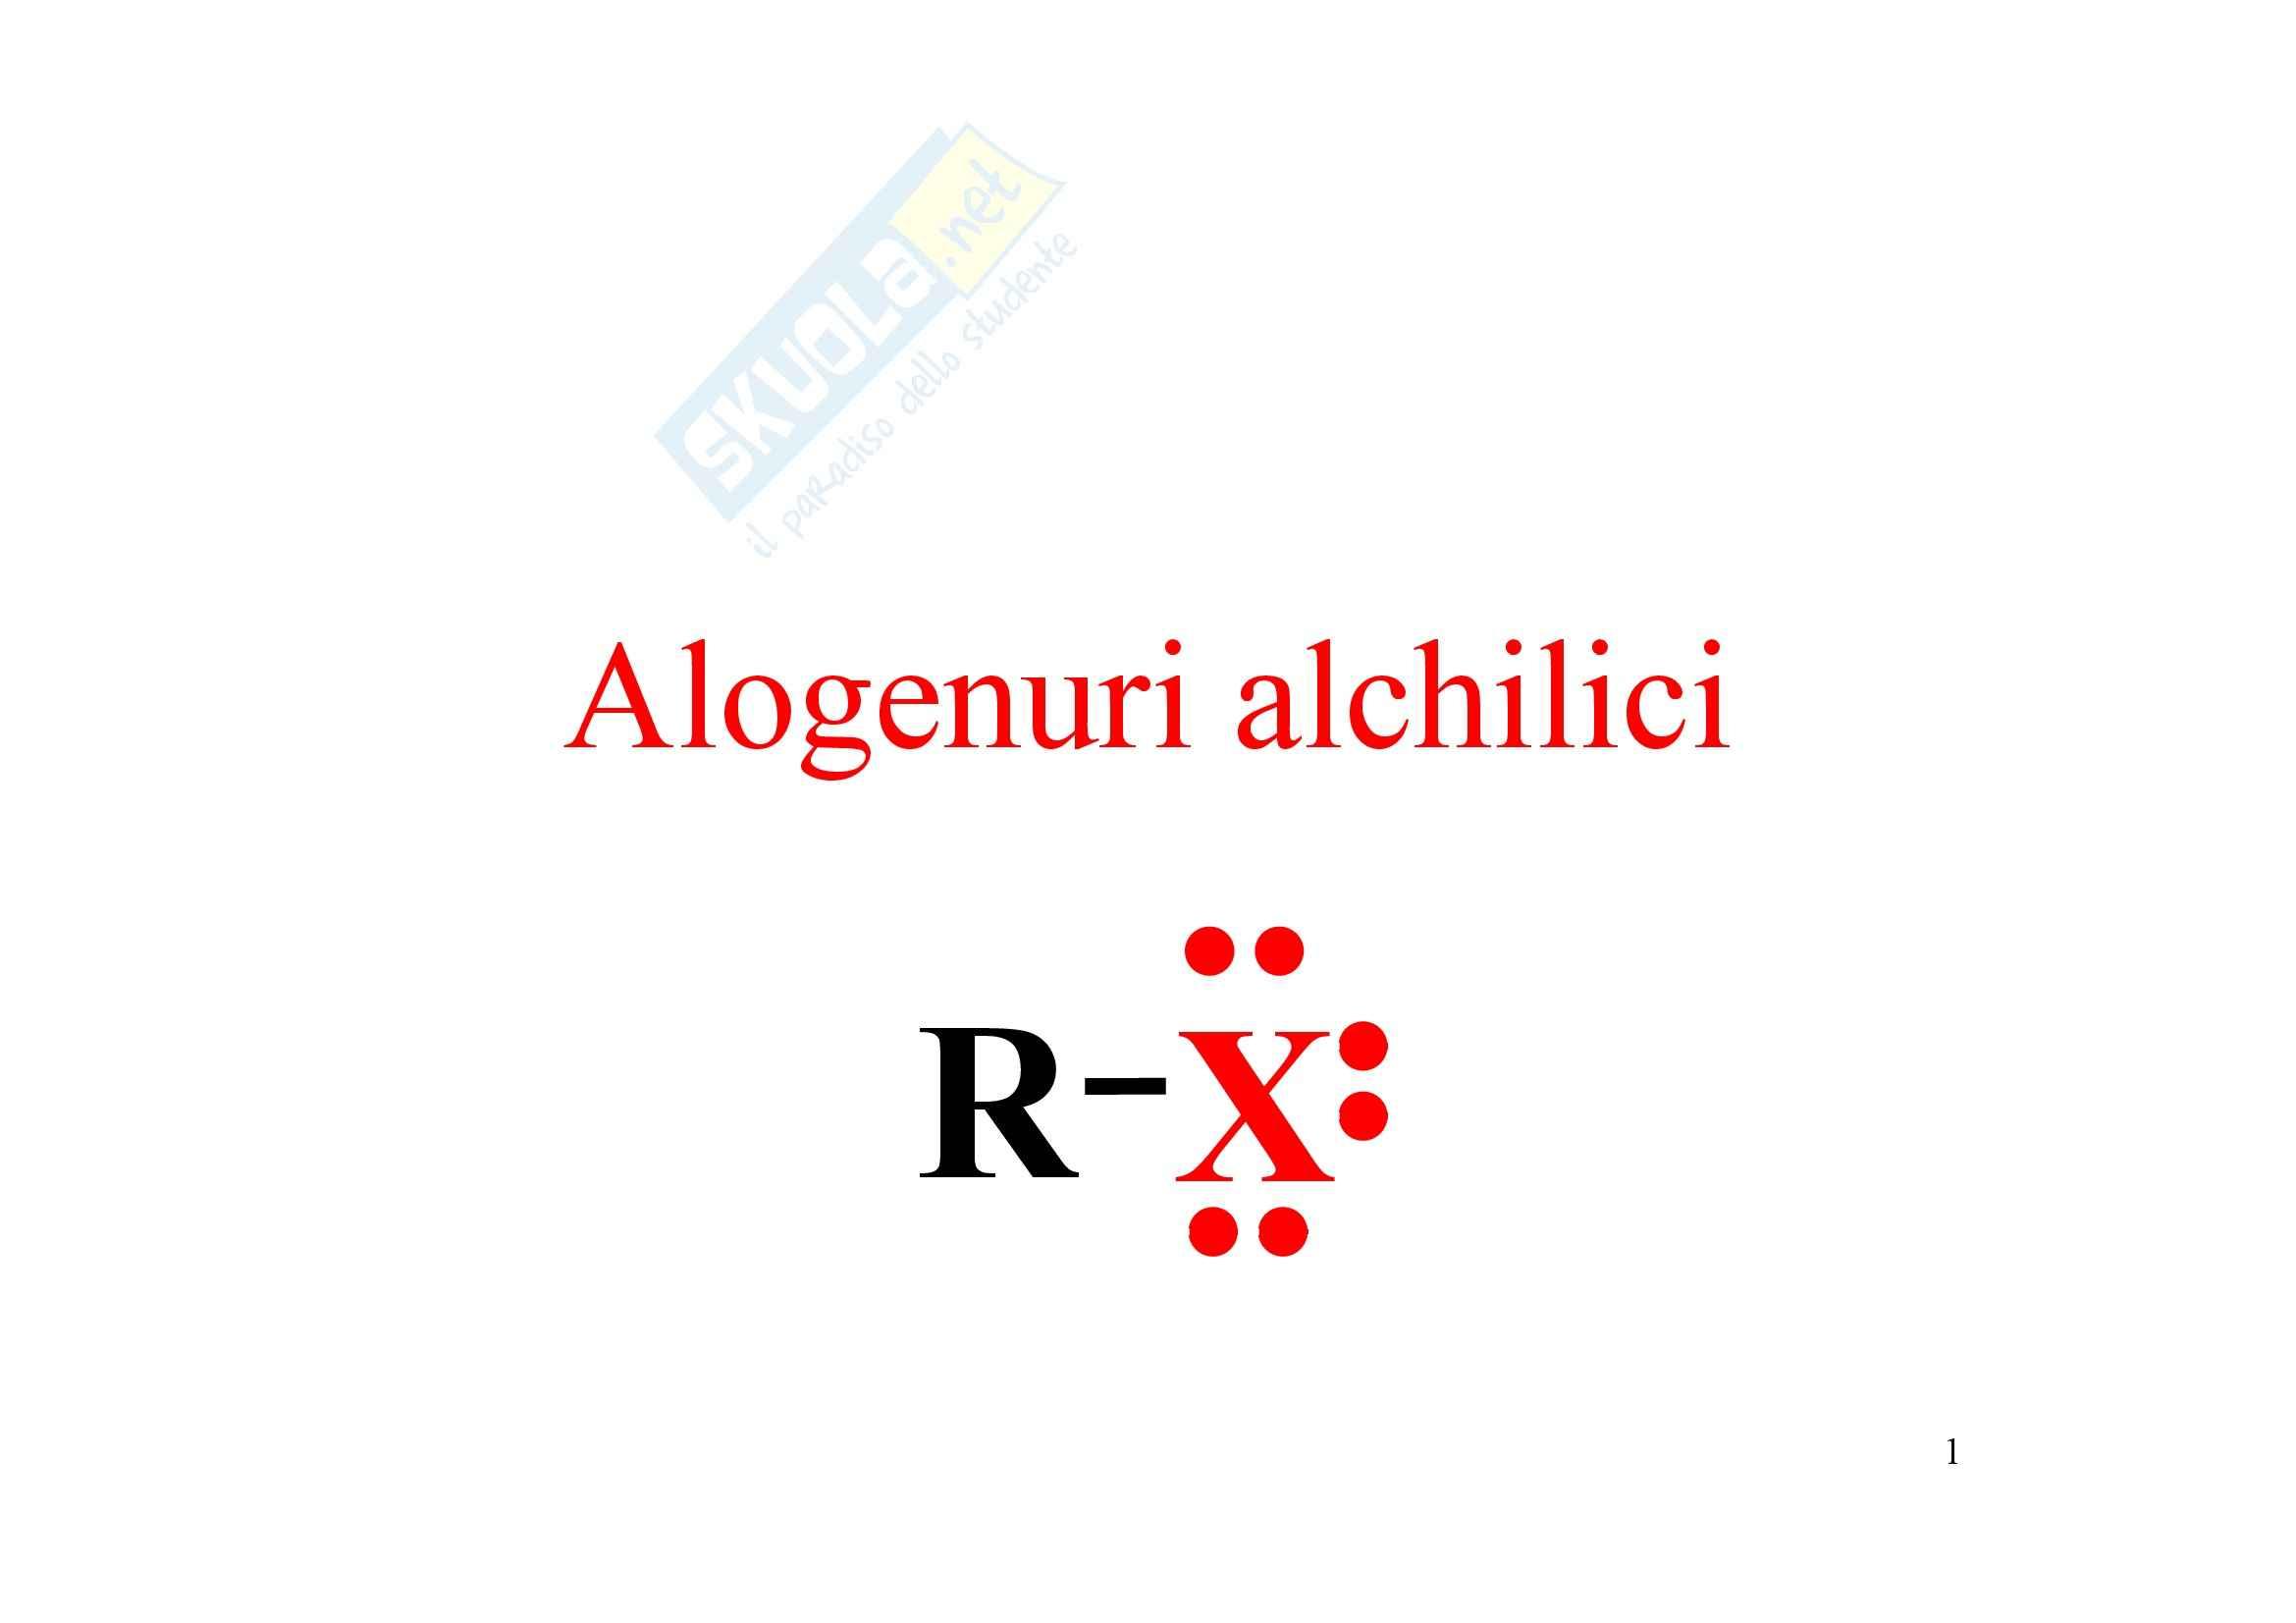 Chimica organica - sostituzione nucleofila